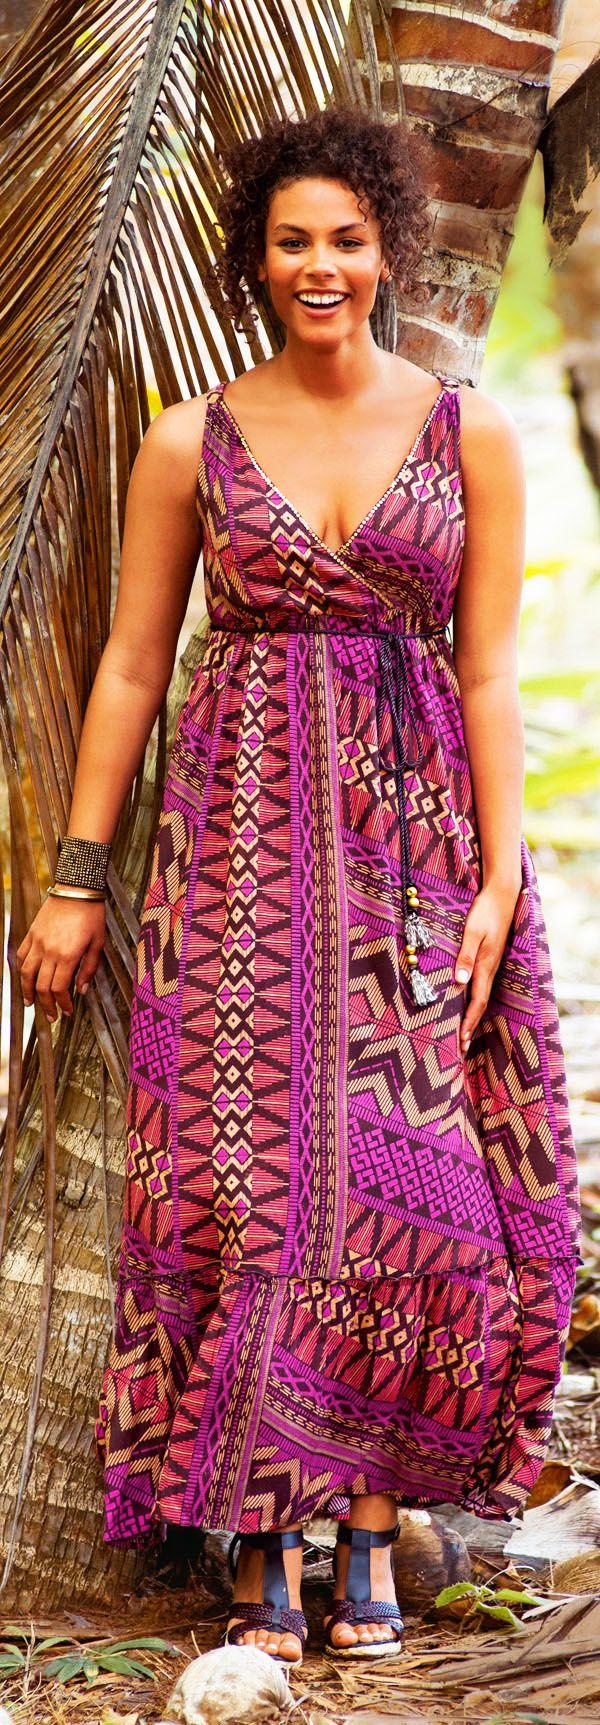 Plus size maxi hippie dresses - la redoute photo - CLICK TO READ at http://boomerinas.com/2012/07/boho-chic-hippie-clothes-plus-size-maxi-dresses/